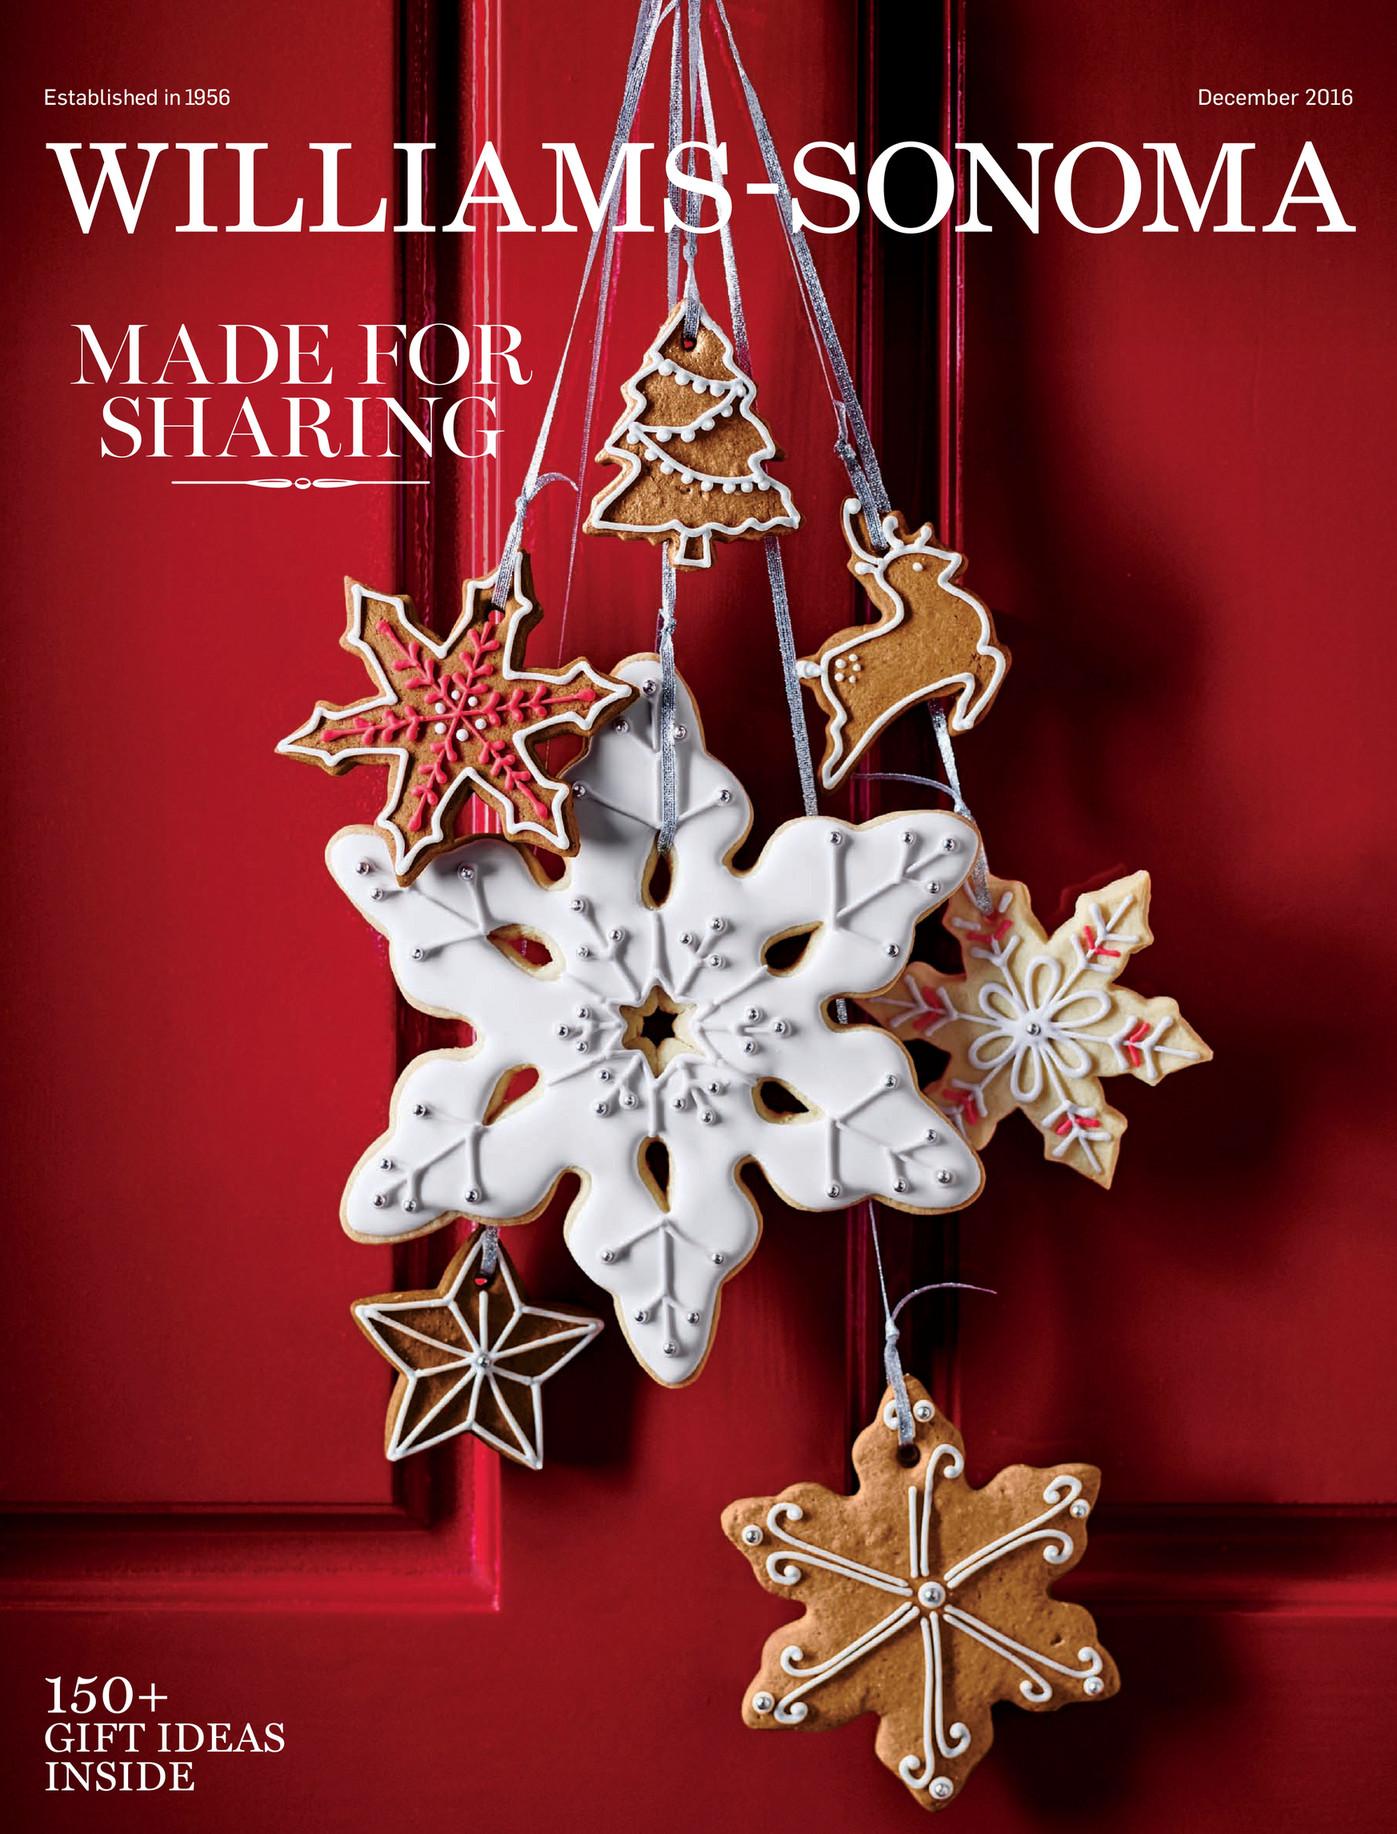 Williams Sonoma Christmas Catalog.Williams Sonoma December 2016 Holiday 4 Catalog Page 40 41